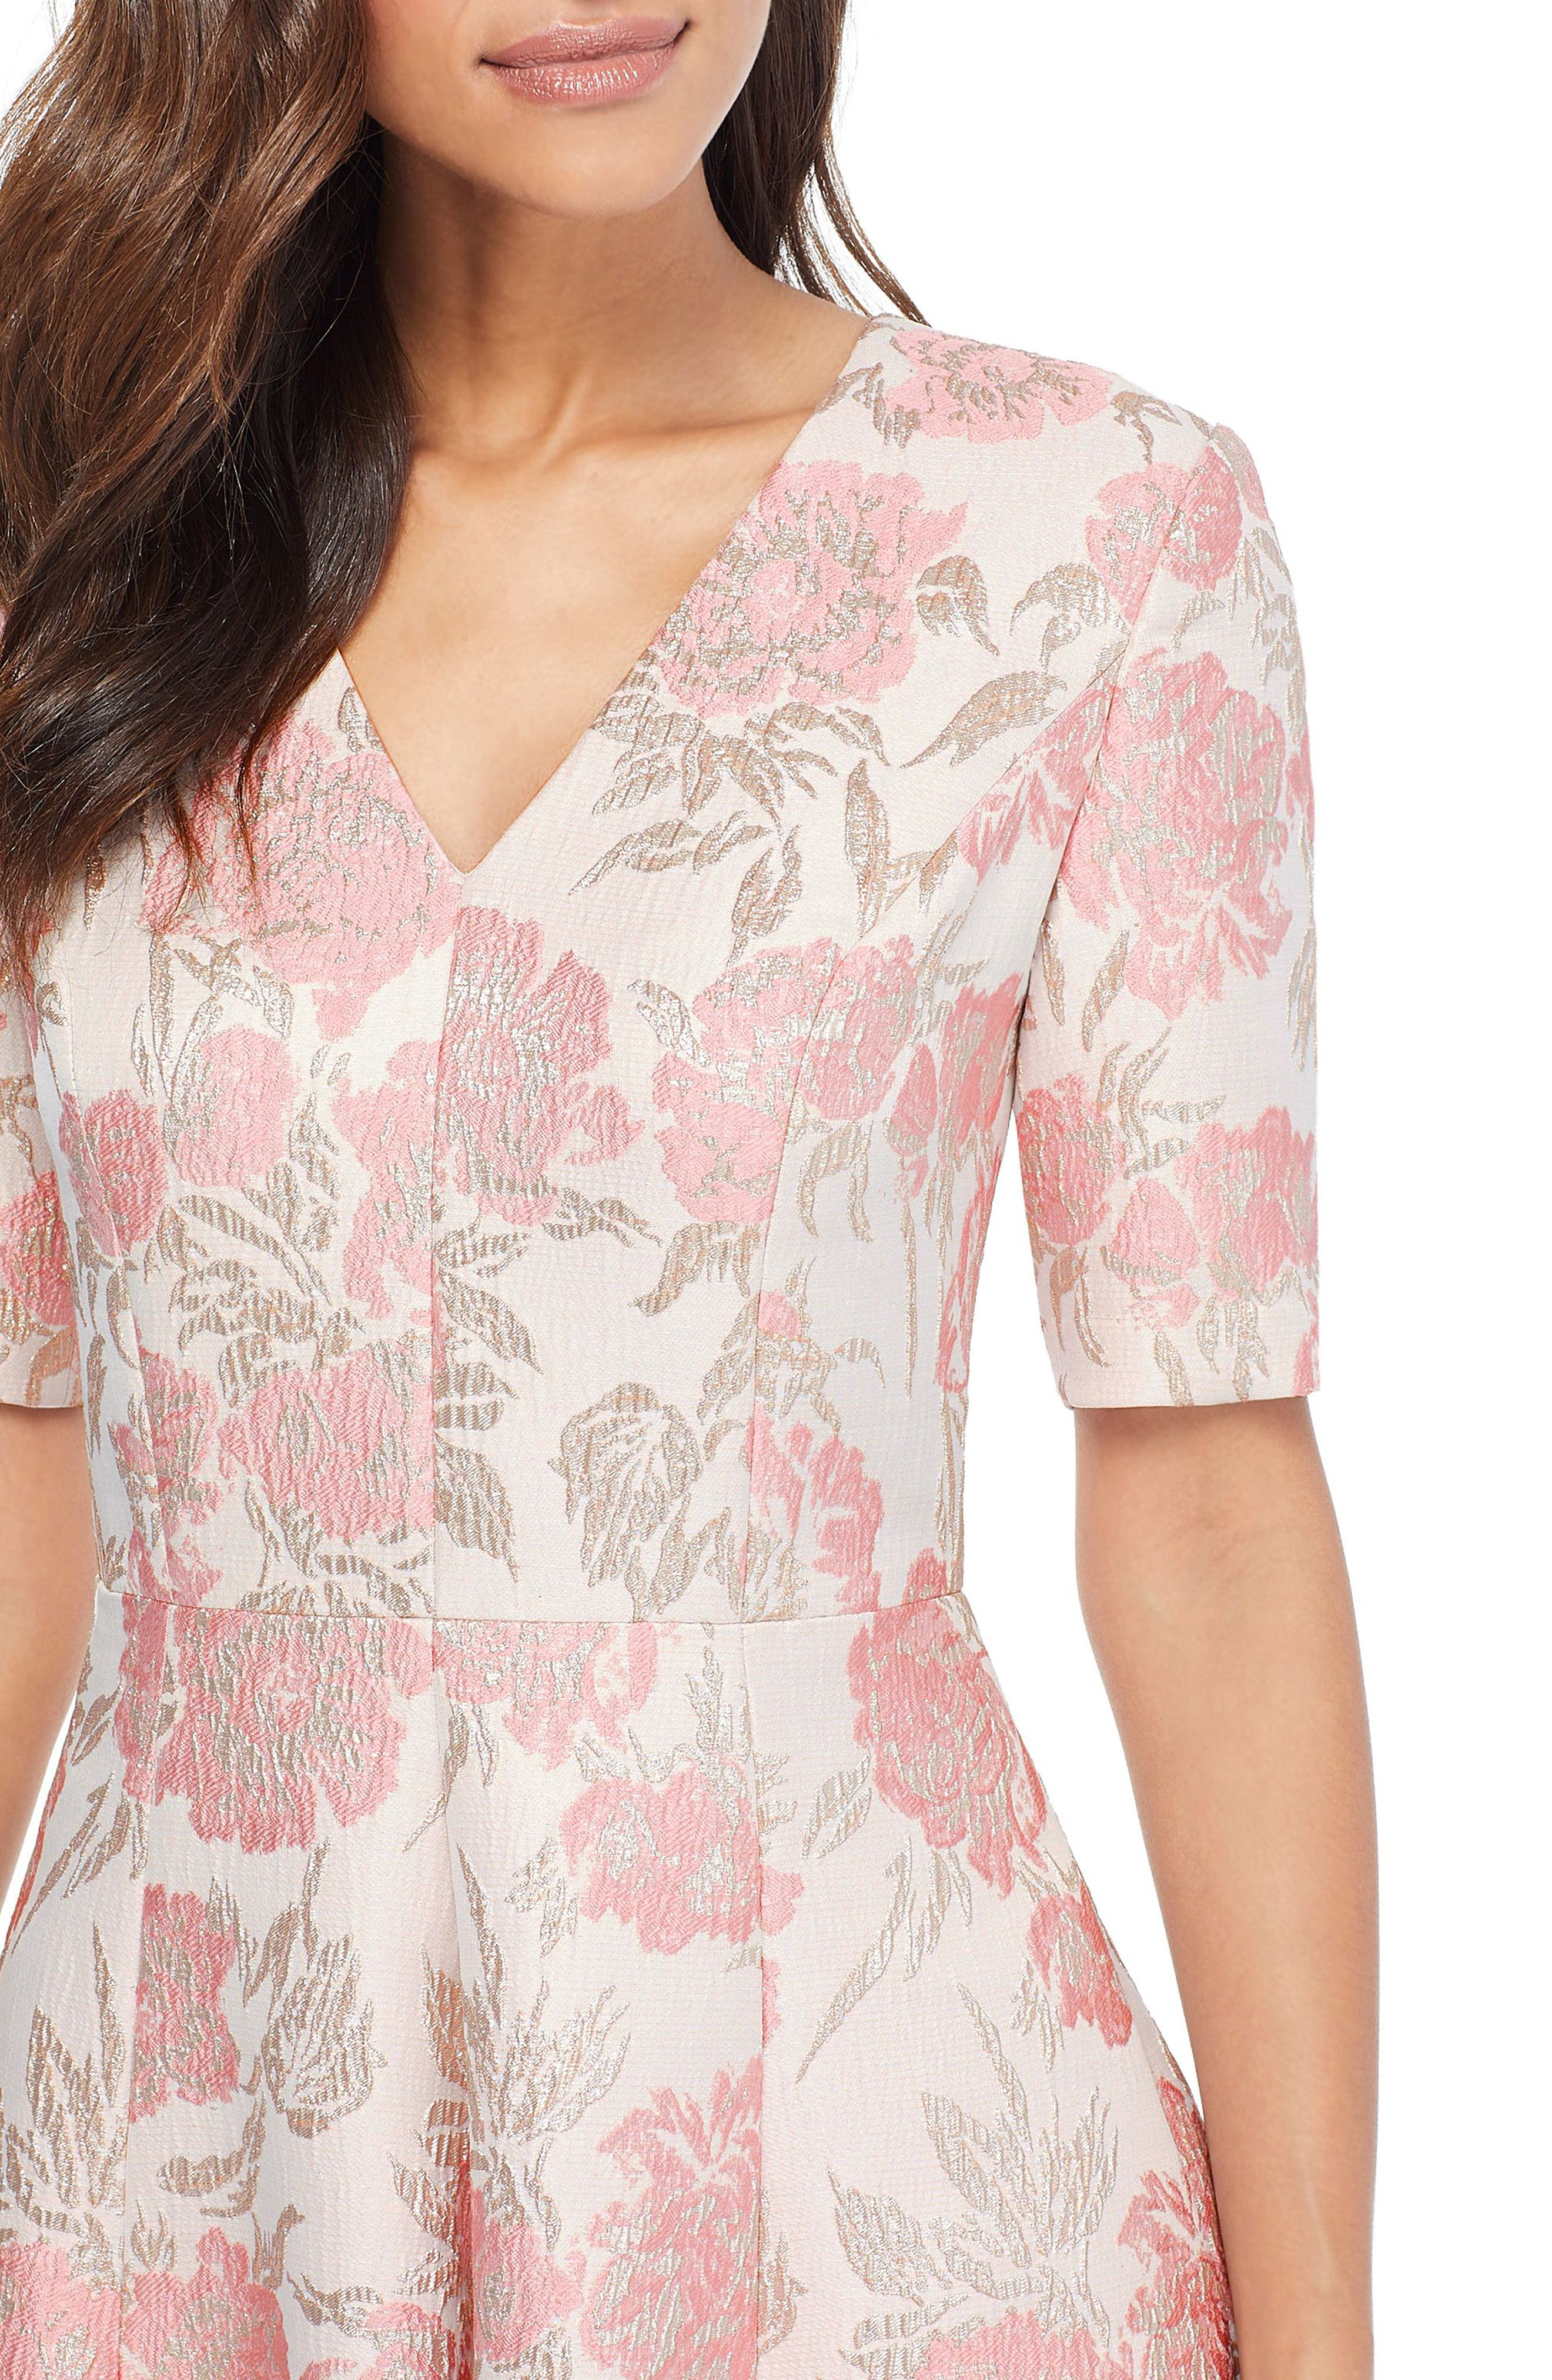 Adair Pink Passion Rose Jacquard Fit & Flare Dress,                             Alternate thumbnail 4, color,                             PINK PEARL